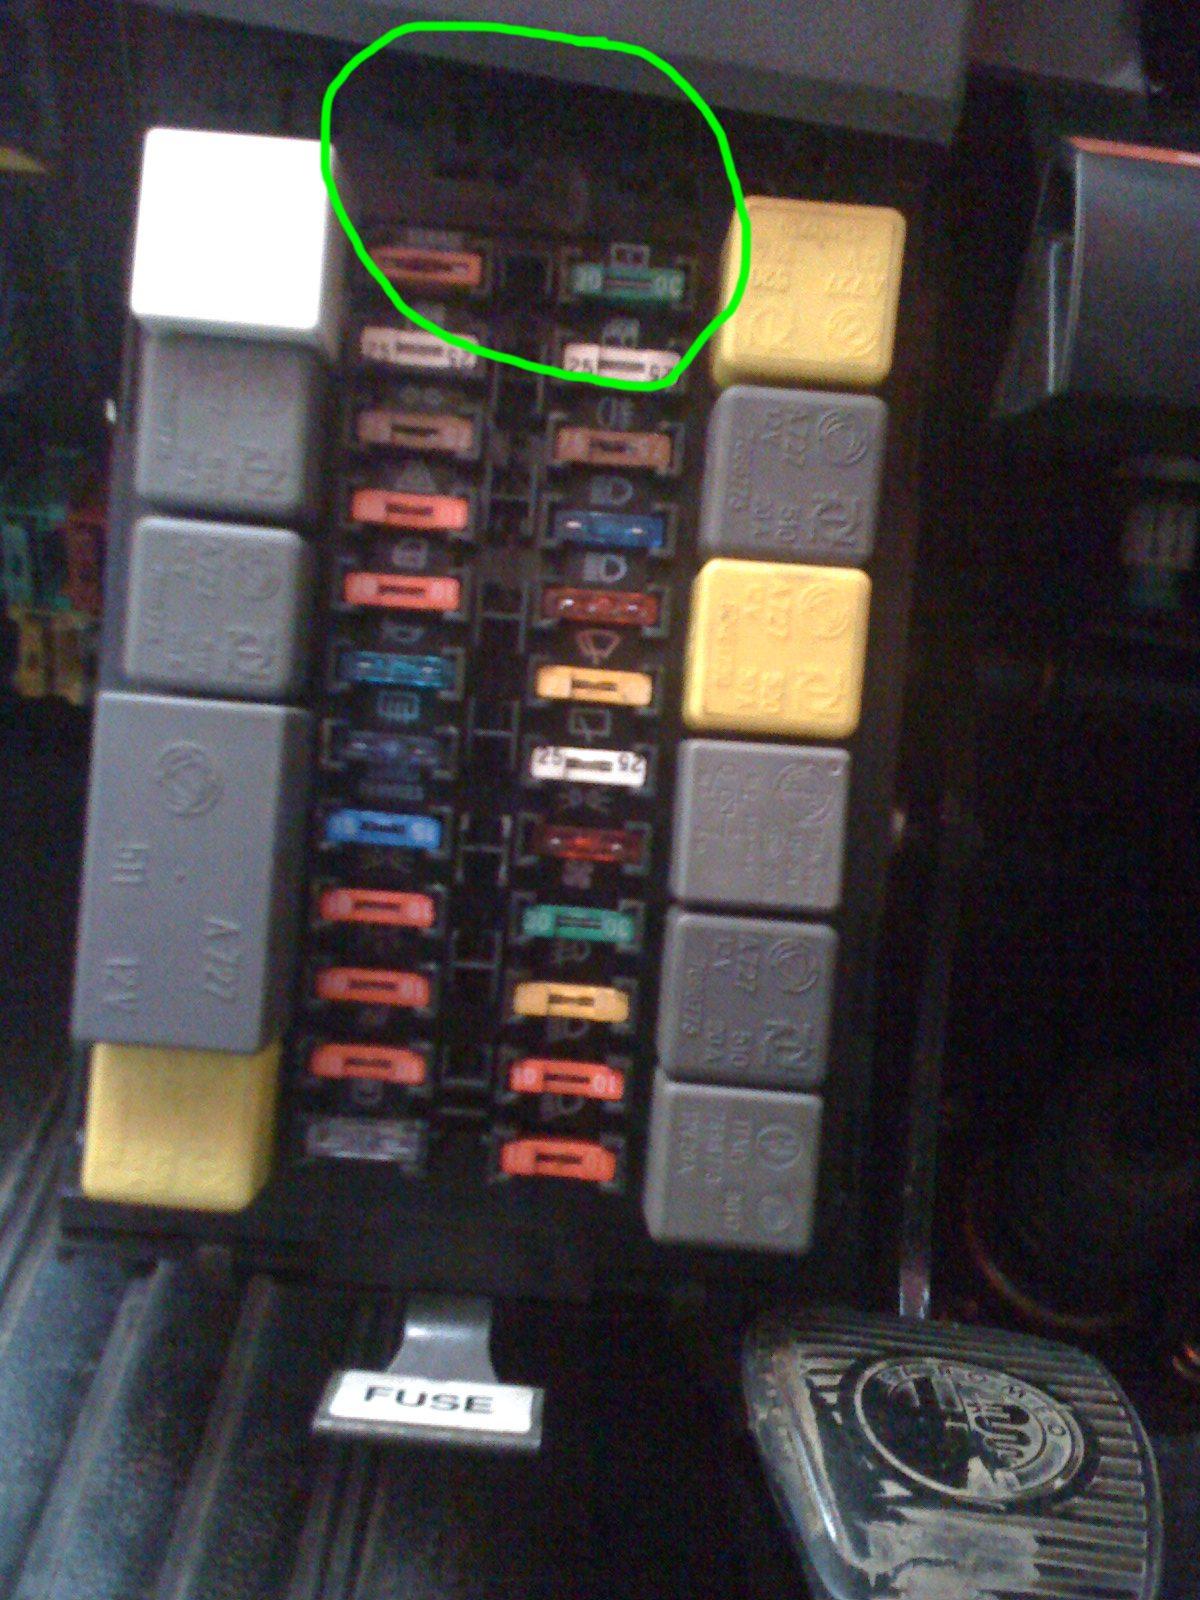 [FPWZ_2684]  VS_0658] Alfa Romeo 146 Fuse Box Download Diagram | Alfa Romeo 146 Fuse Box |  | Crove Heeve Mohammedshrine Librar Wiring 101